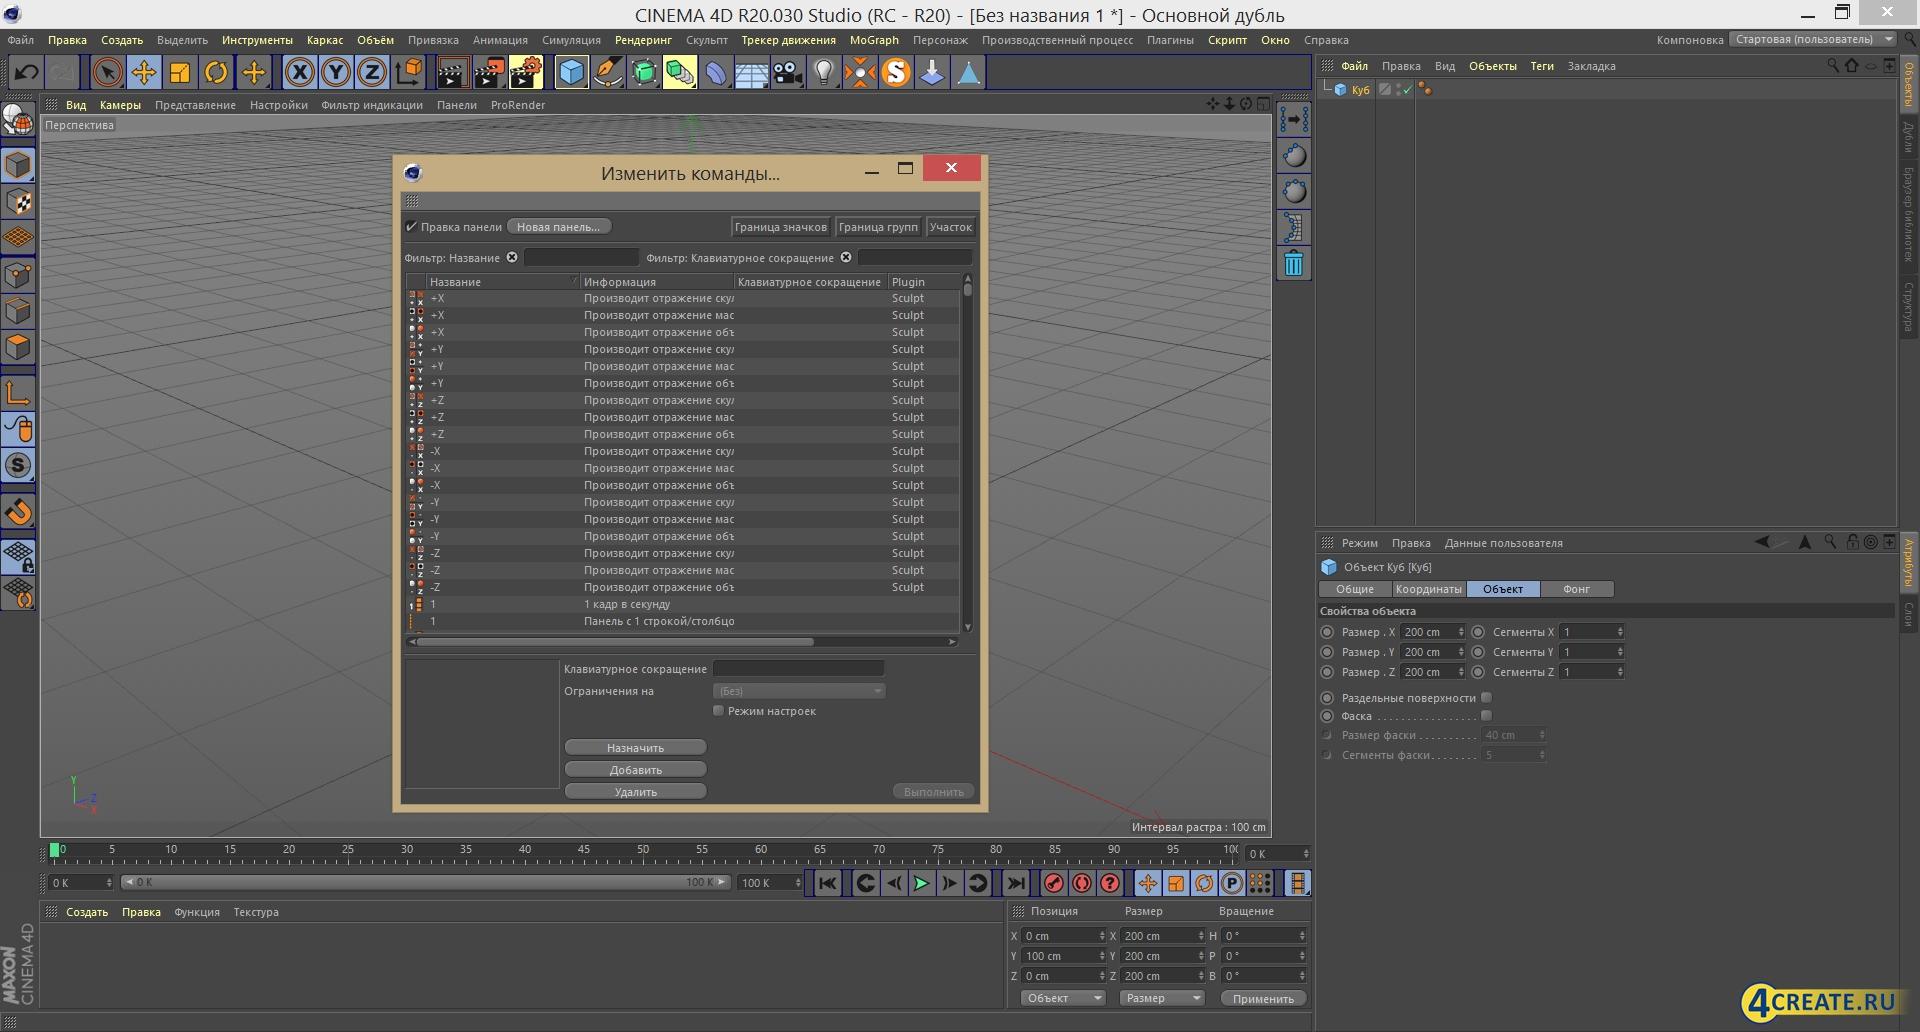 CINEMA 4D Studio R20.030 (Скриншот 3)